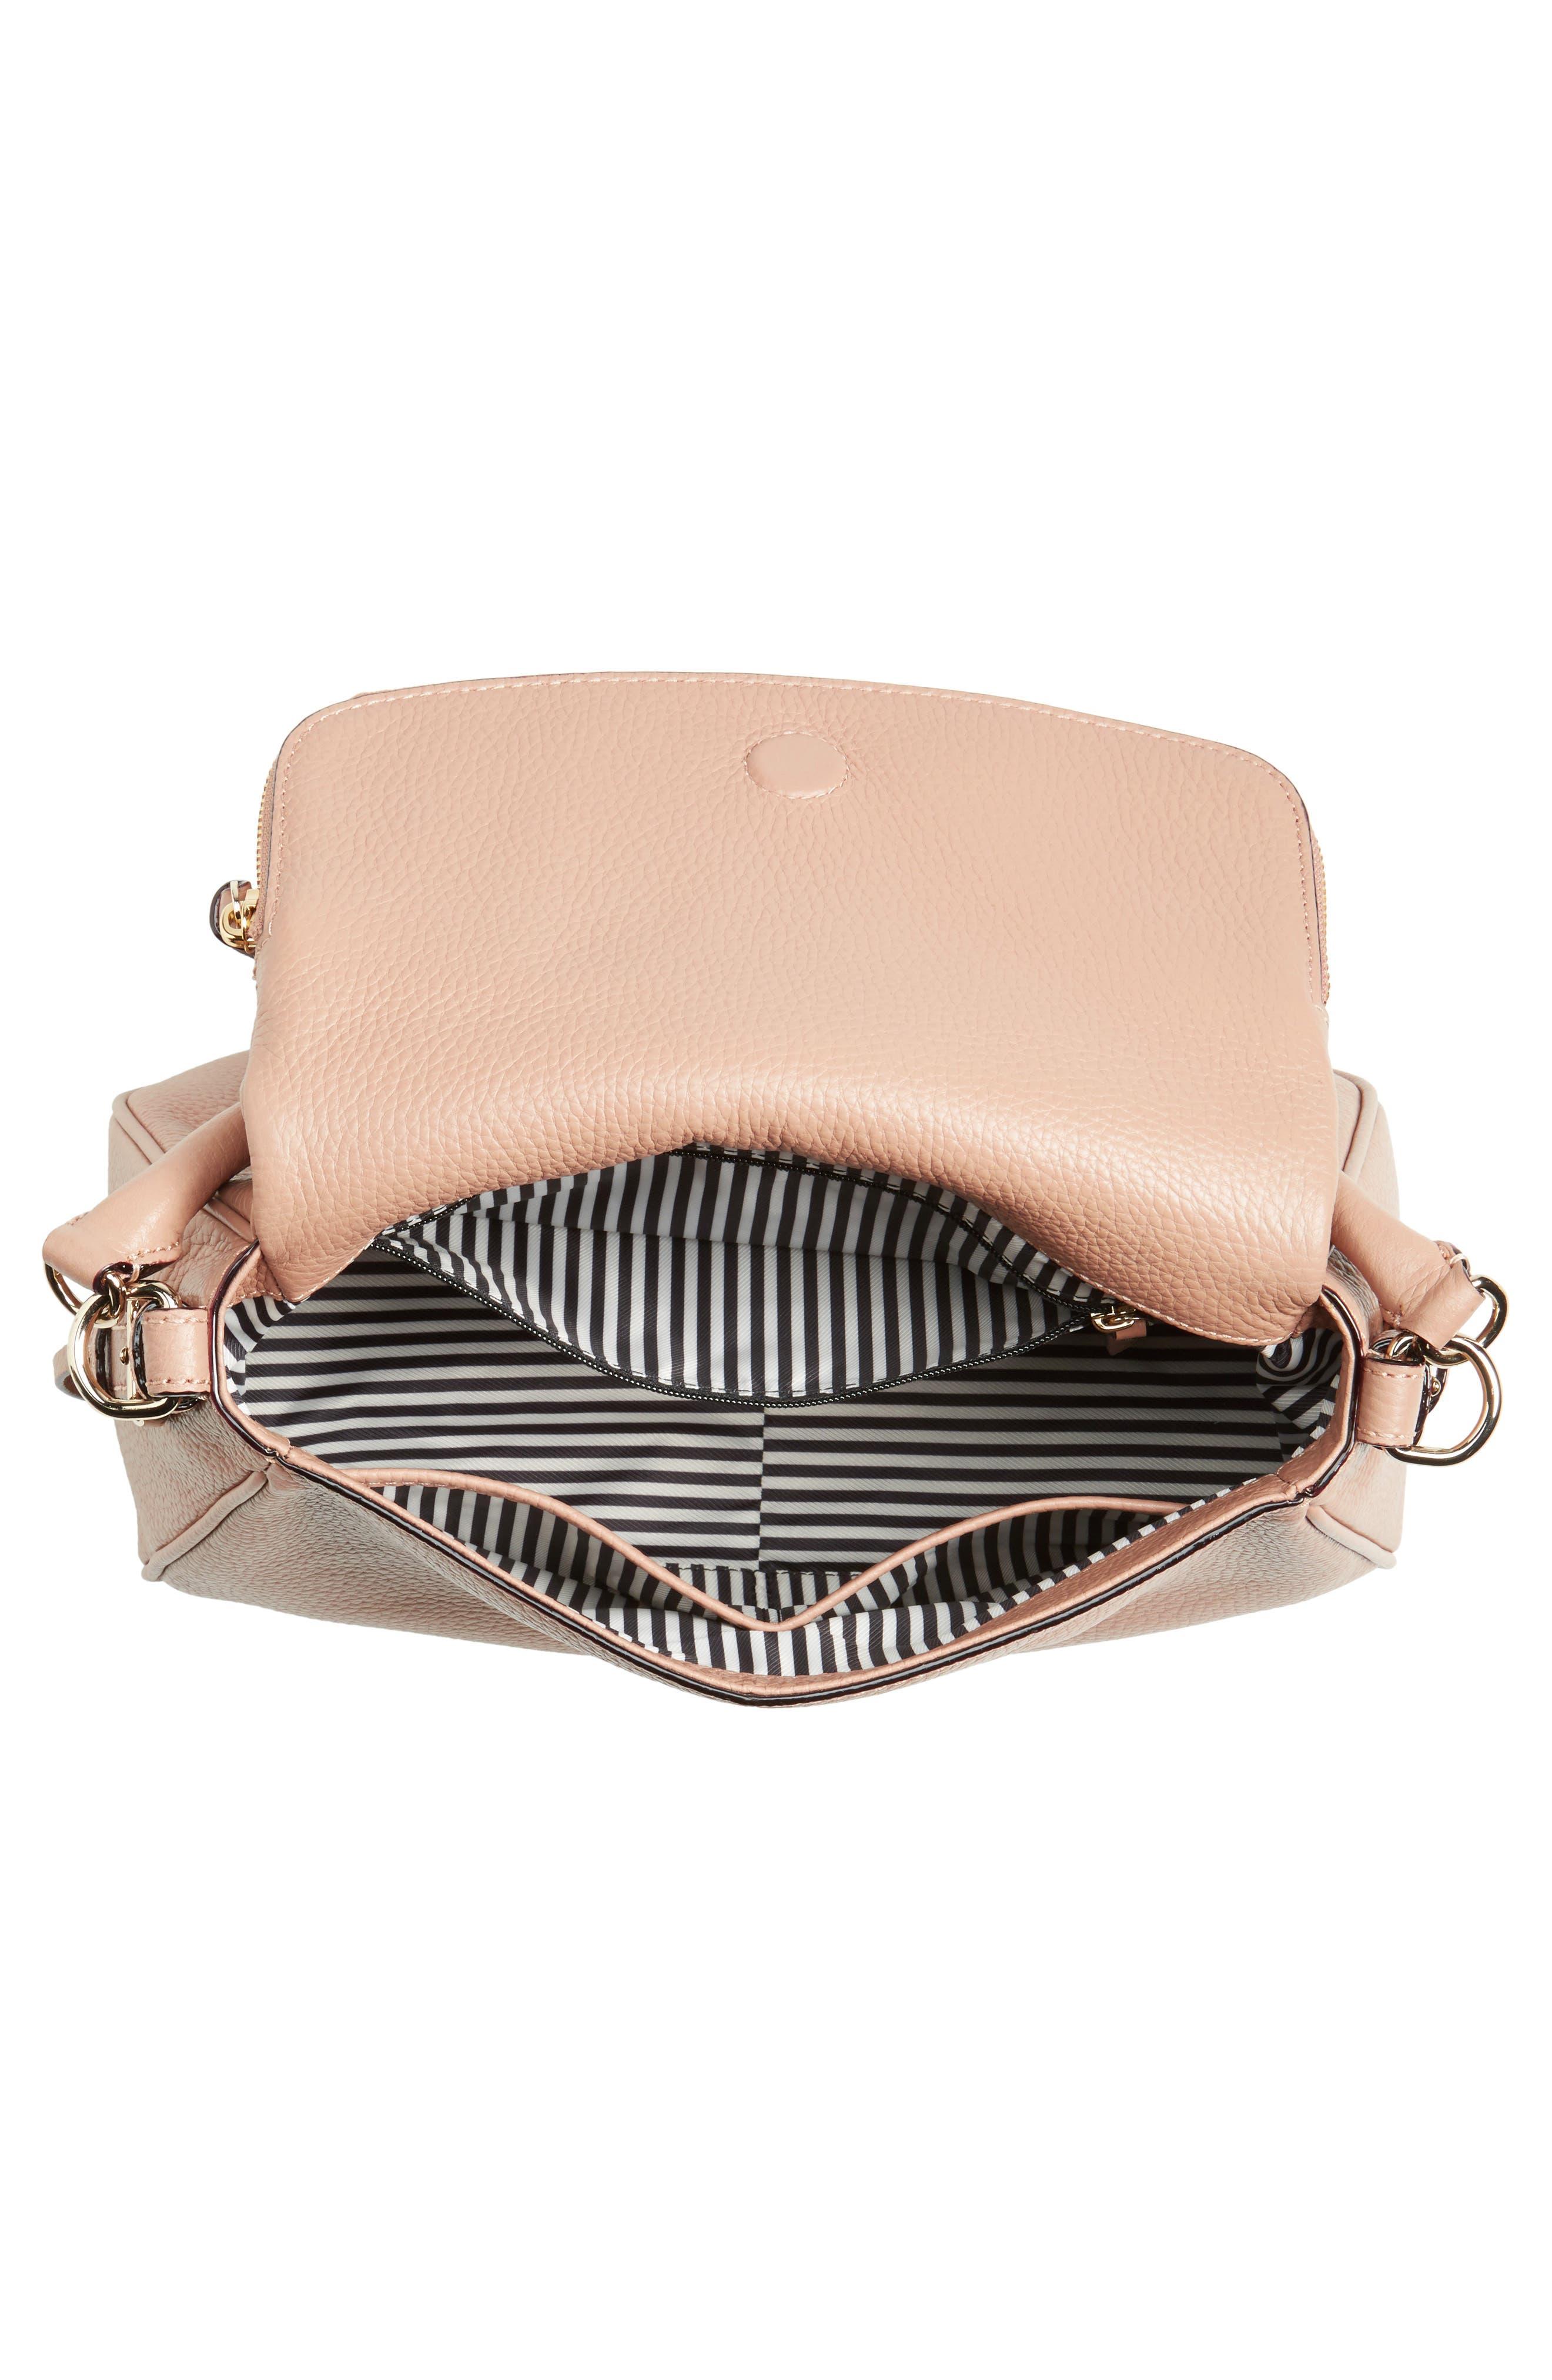 cobble hill - deva leather crossbody bag,                             Alternate thumbnail 25, color,